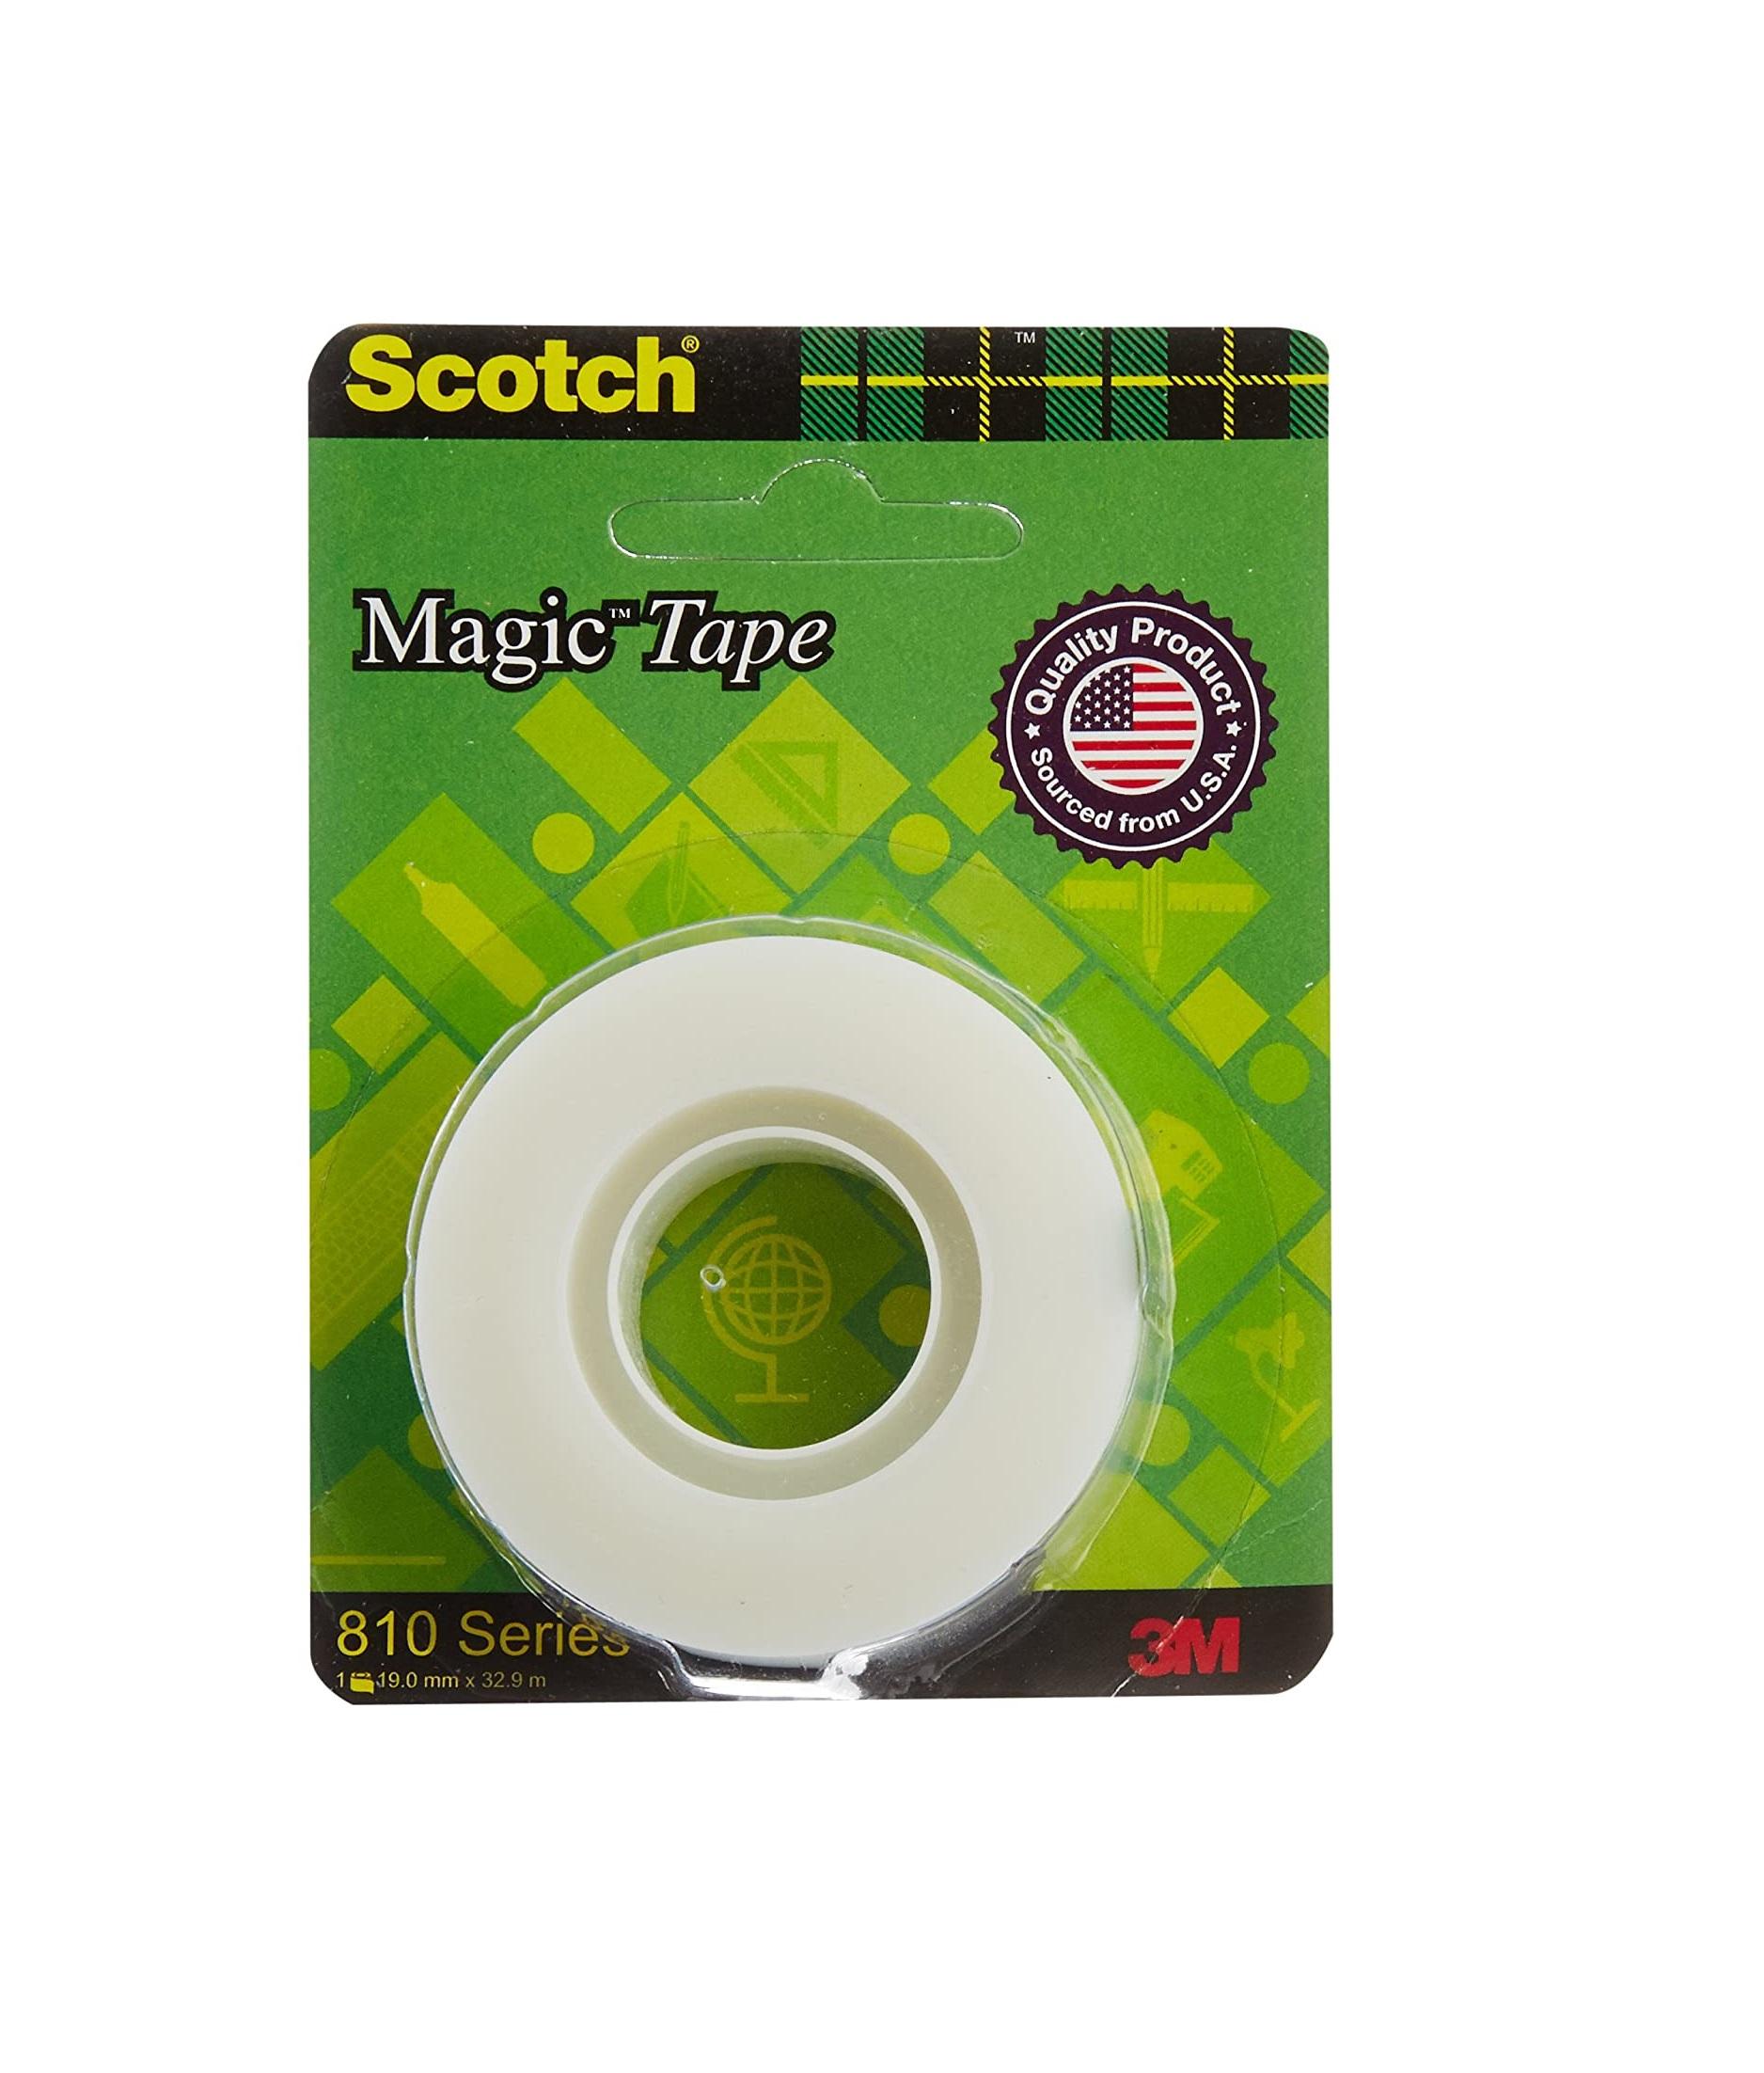 Scotch Magic Blaster Transparent Tape, 19 mm x 32.9 m